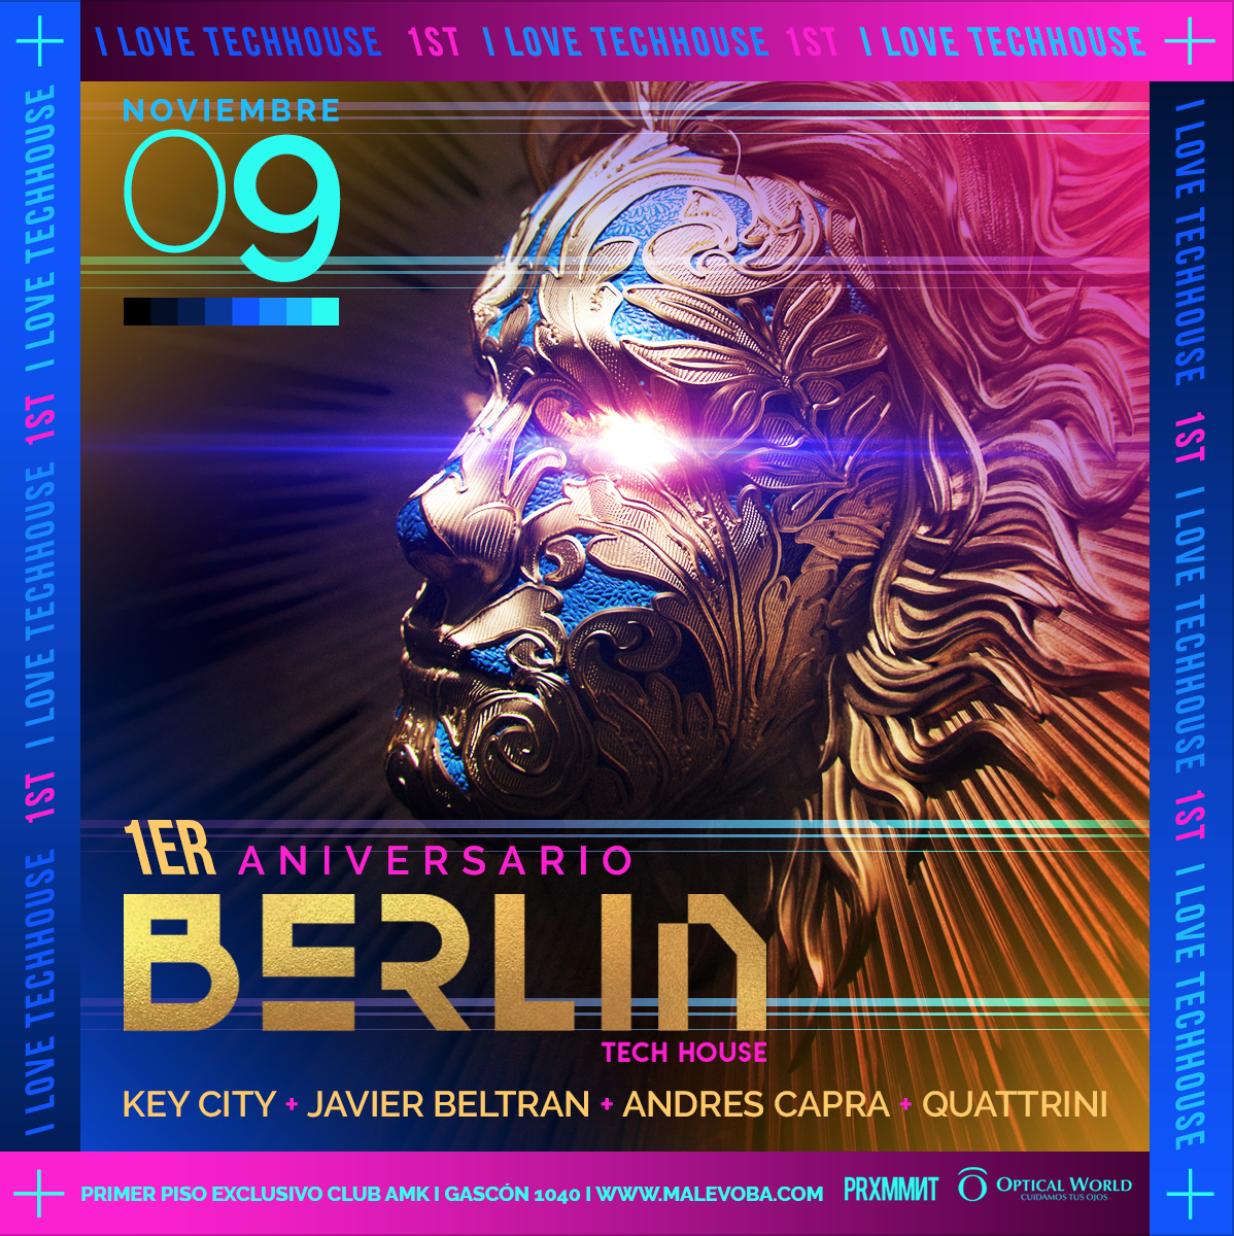 ANIVERSARIO BERLIN VIII 9 NOV